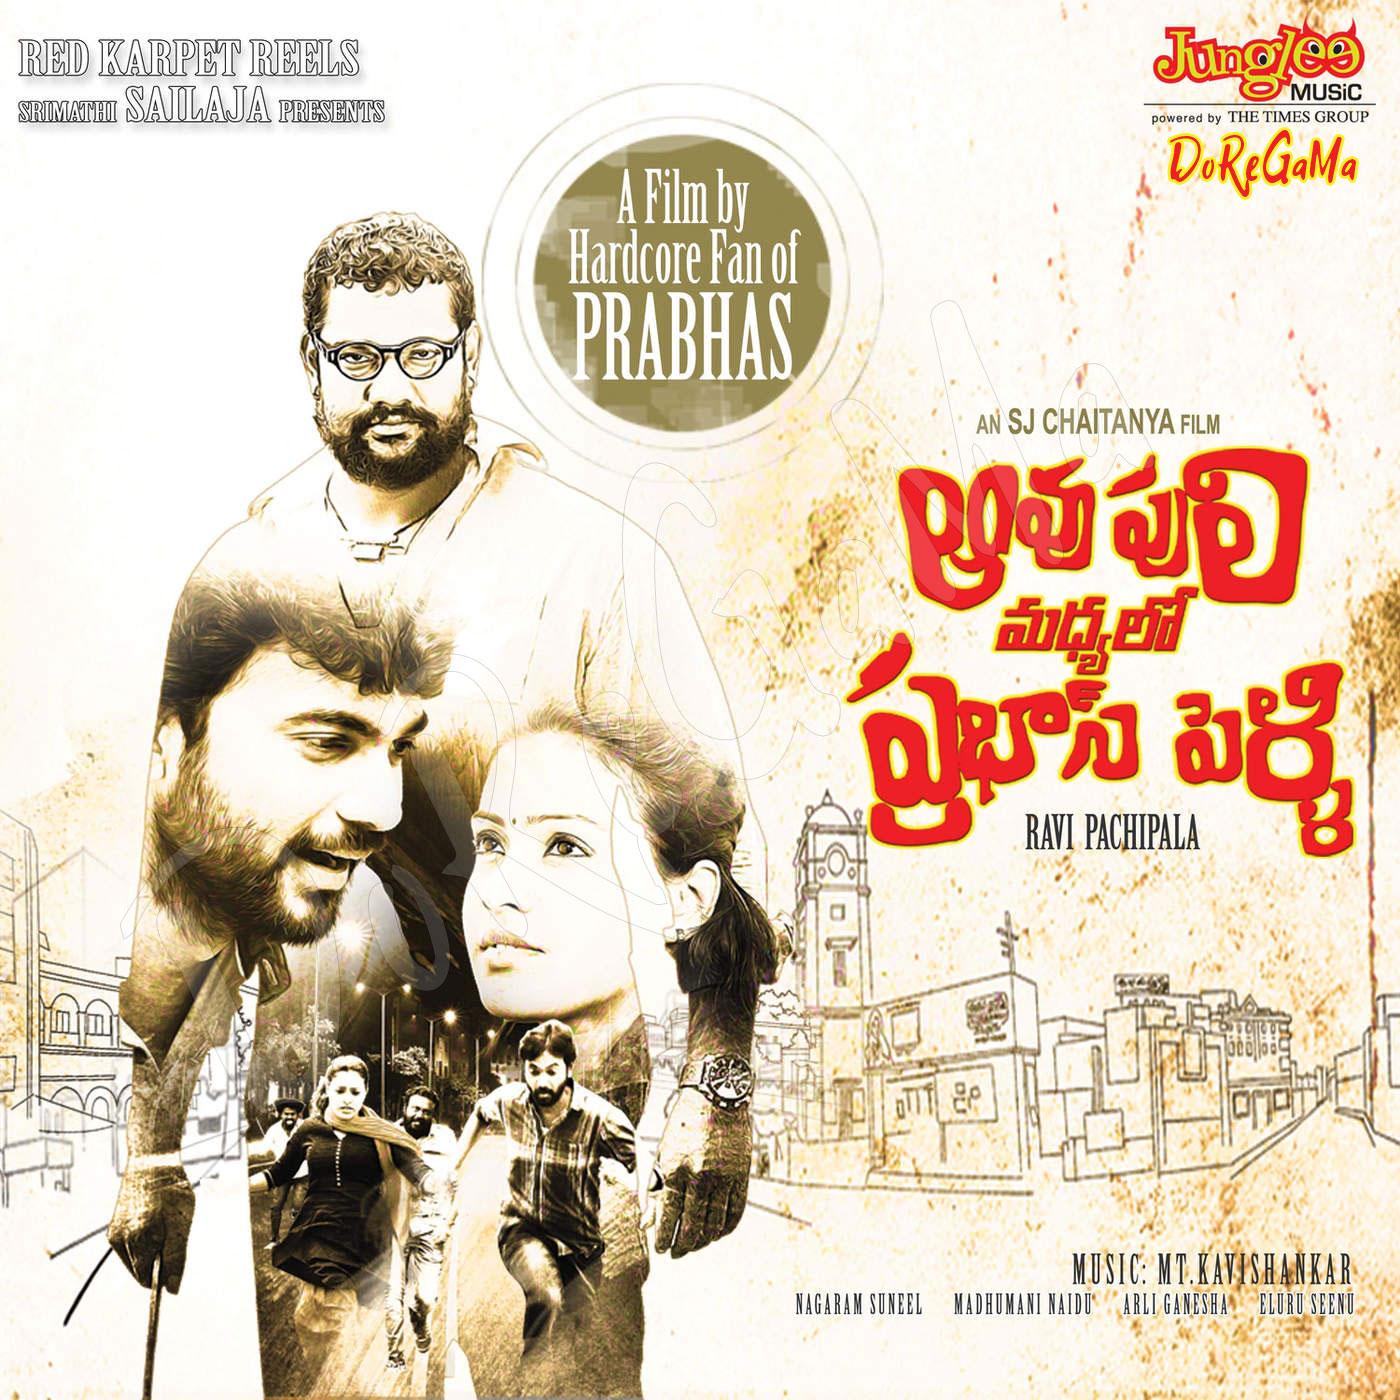 Aavu-Puli-Madhyalo-Prabahas-Pelli-2016-Original-CD-Front-Cover-Poster-Wallpaper-HD